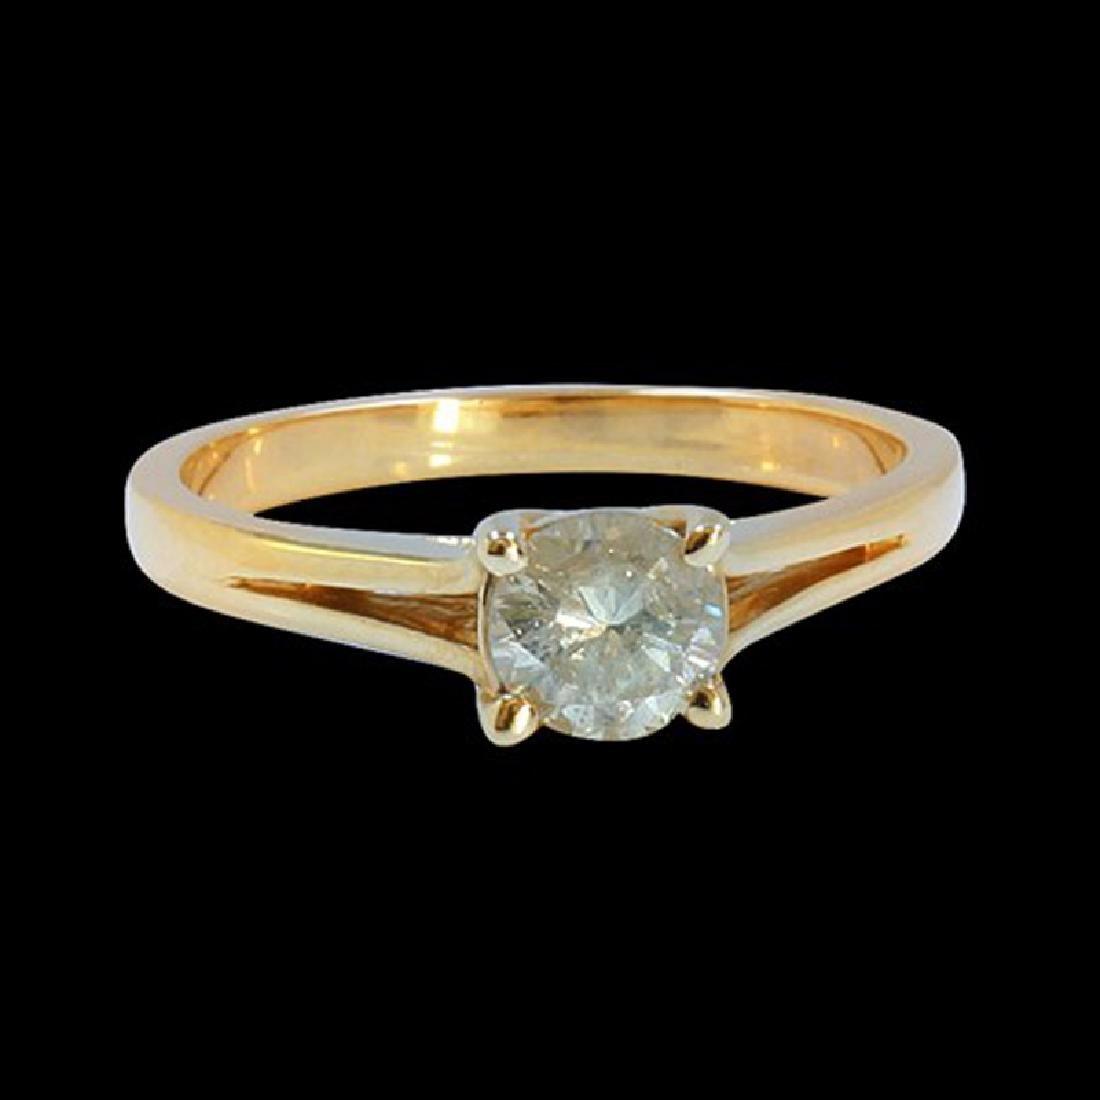 0.60CT NATURAL DIAMOND 14K YELLOW GOLD RING